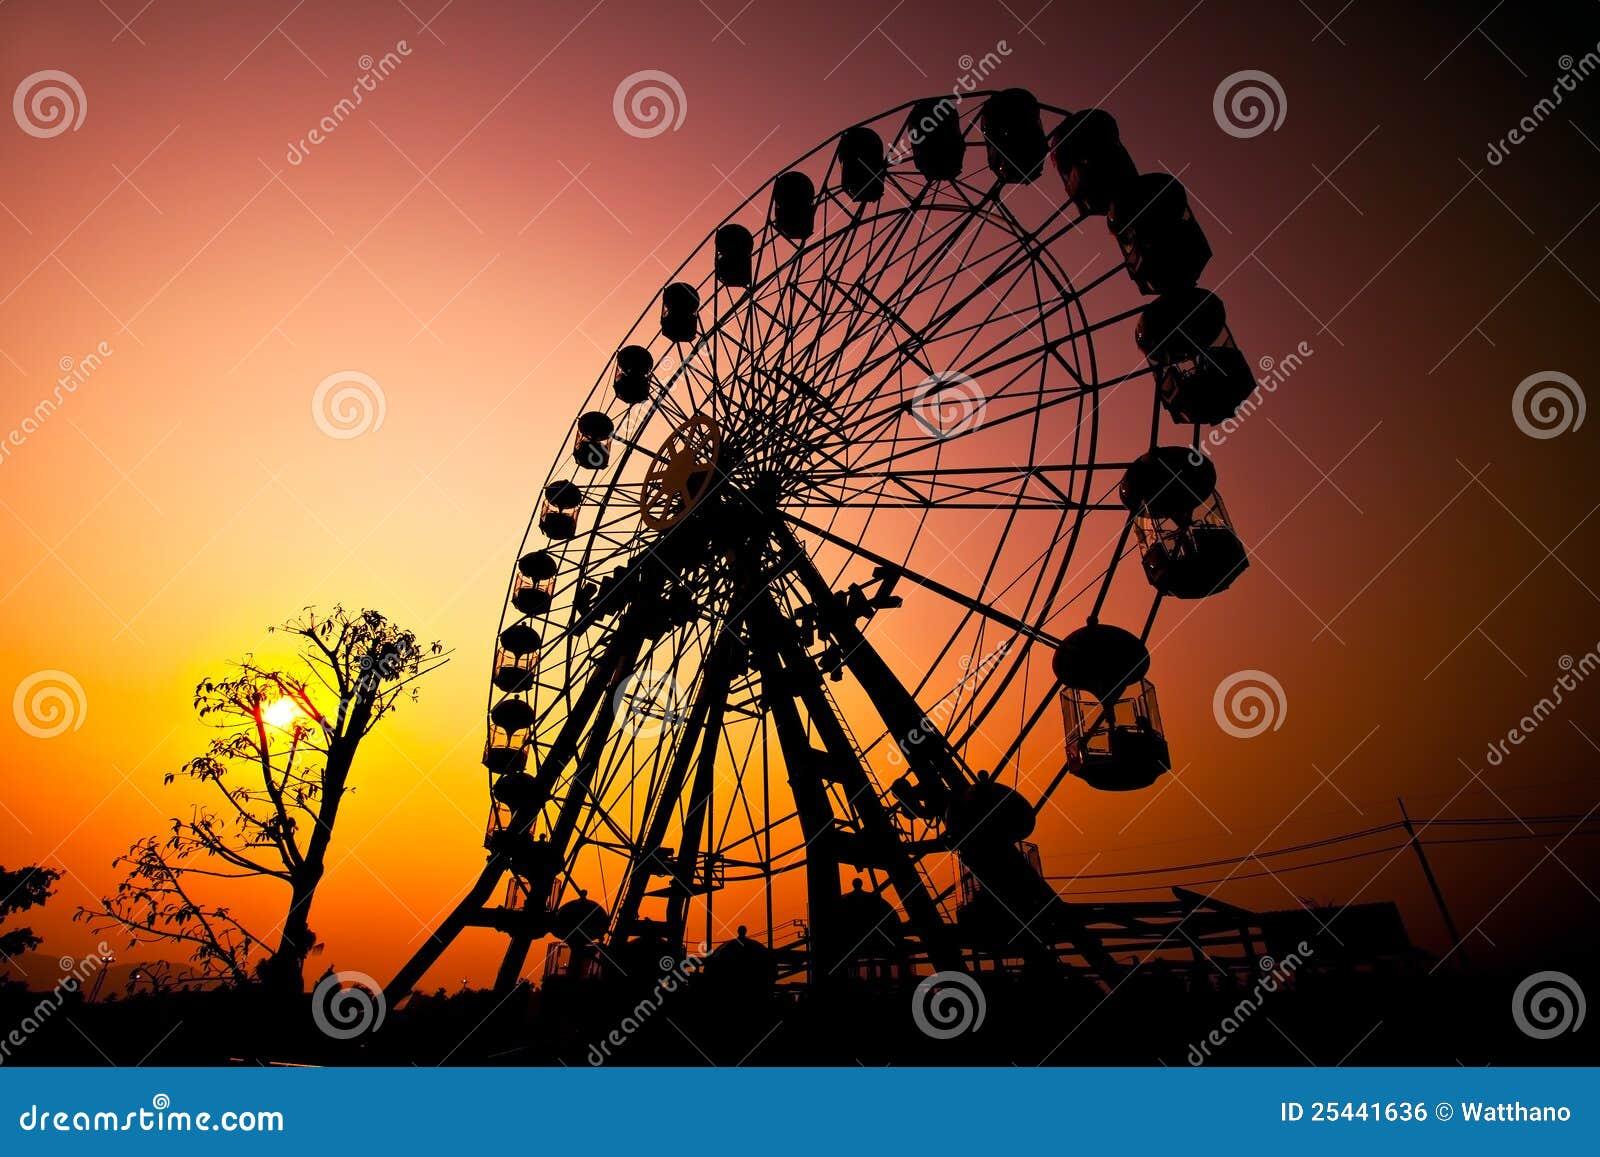 Sunset Silhouette Of Ferris Wheel Royalty Free Stock Image ...